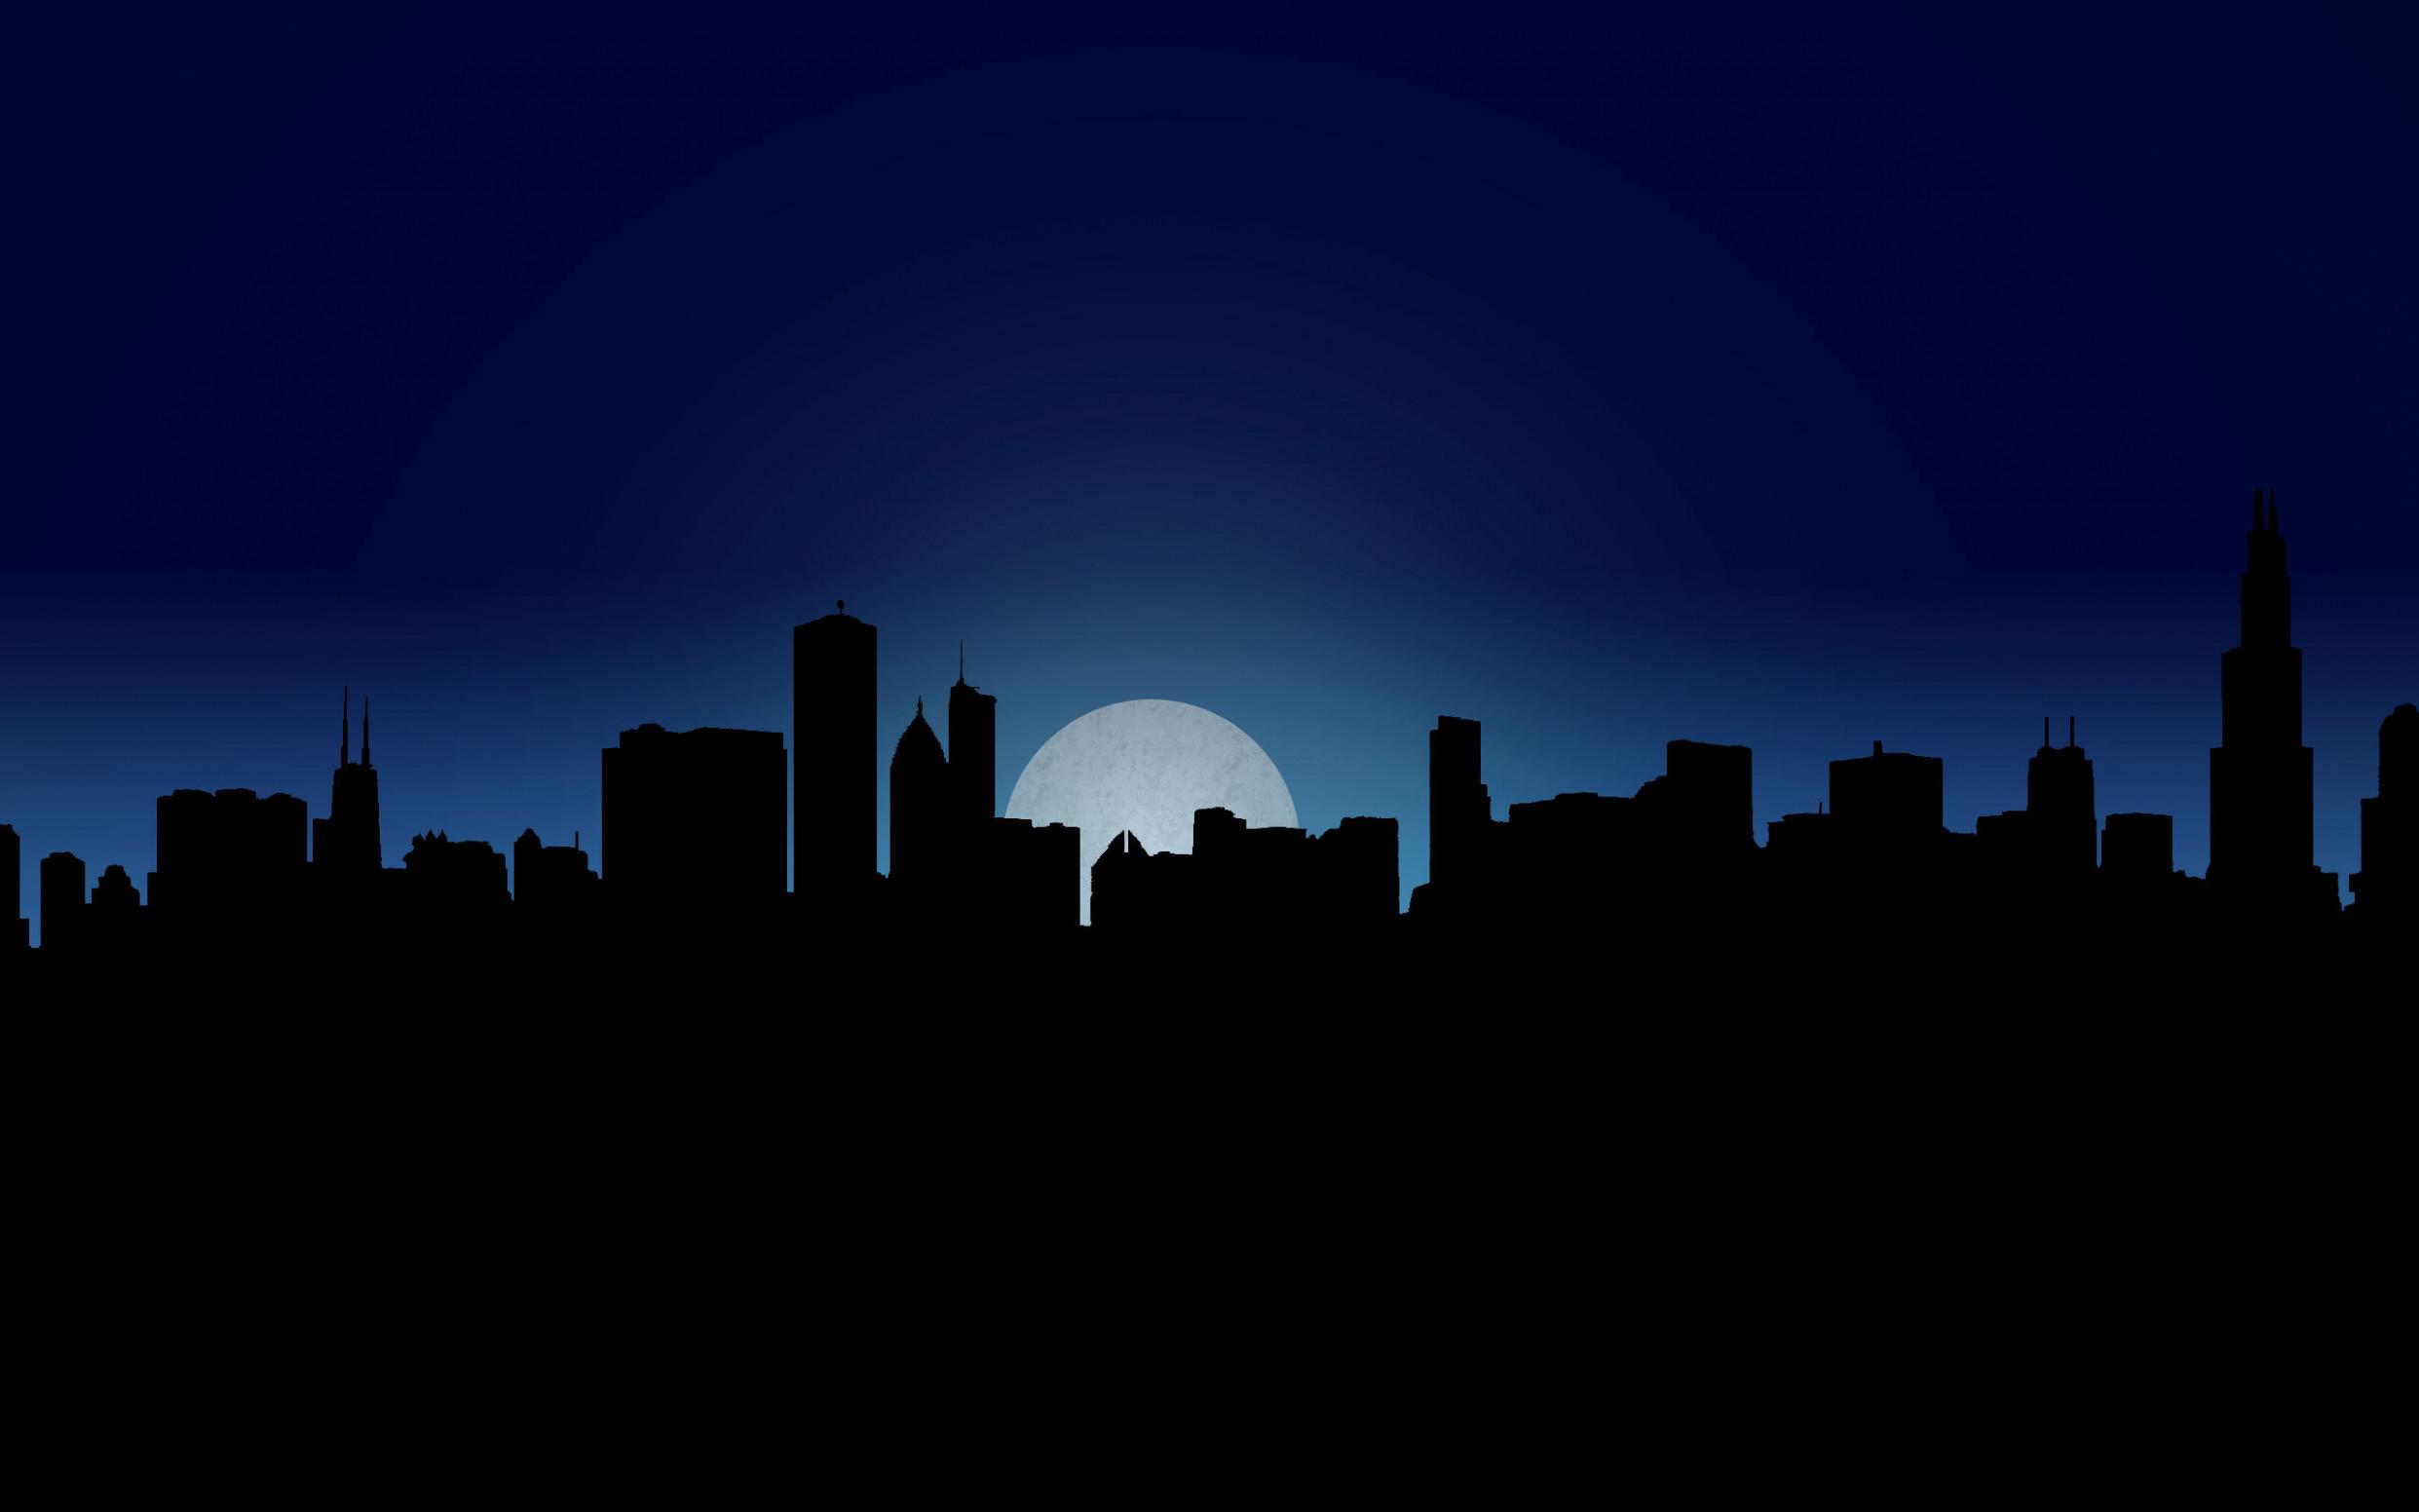 Dark City Wallpaper - Cartoon Dark City Background - HD Wallpaper